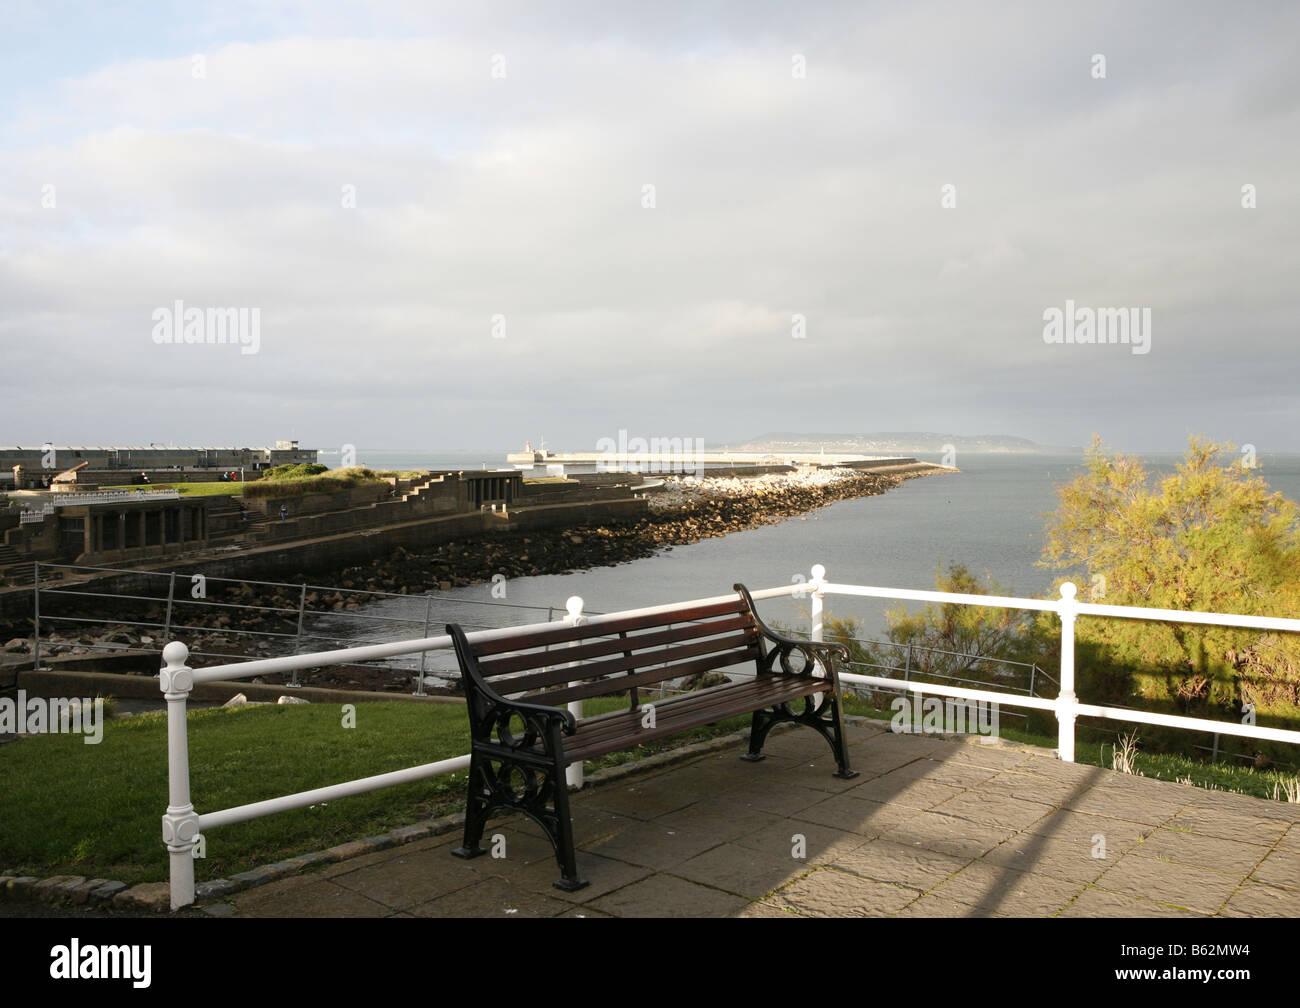 East Pier DunLaoghaire Pier Co Dublin CoDublin County Ireland Dun Laoghaire Eire - Stock Image